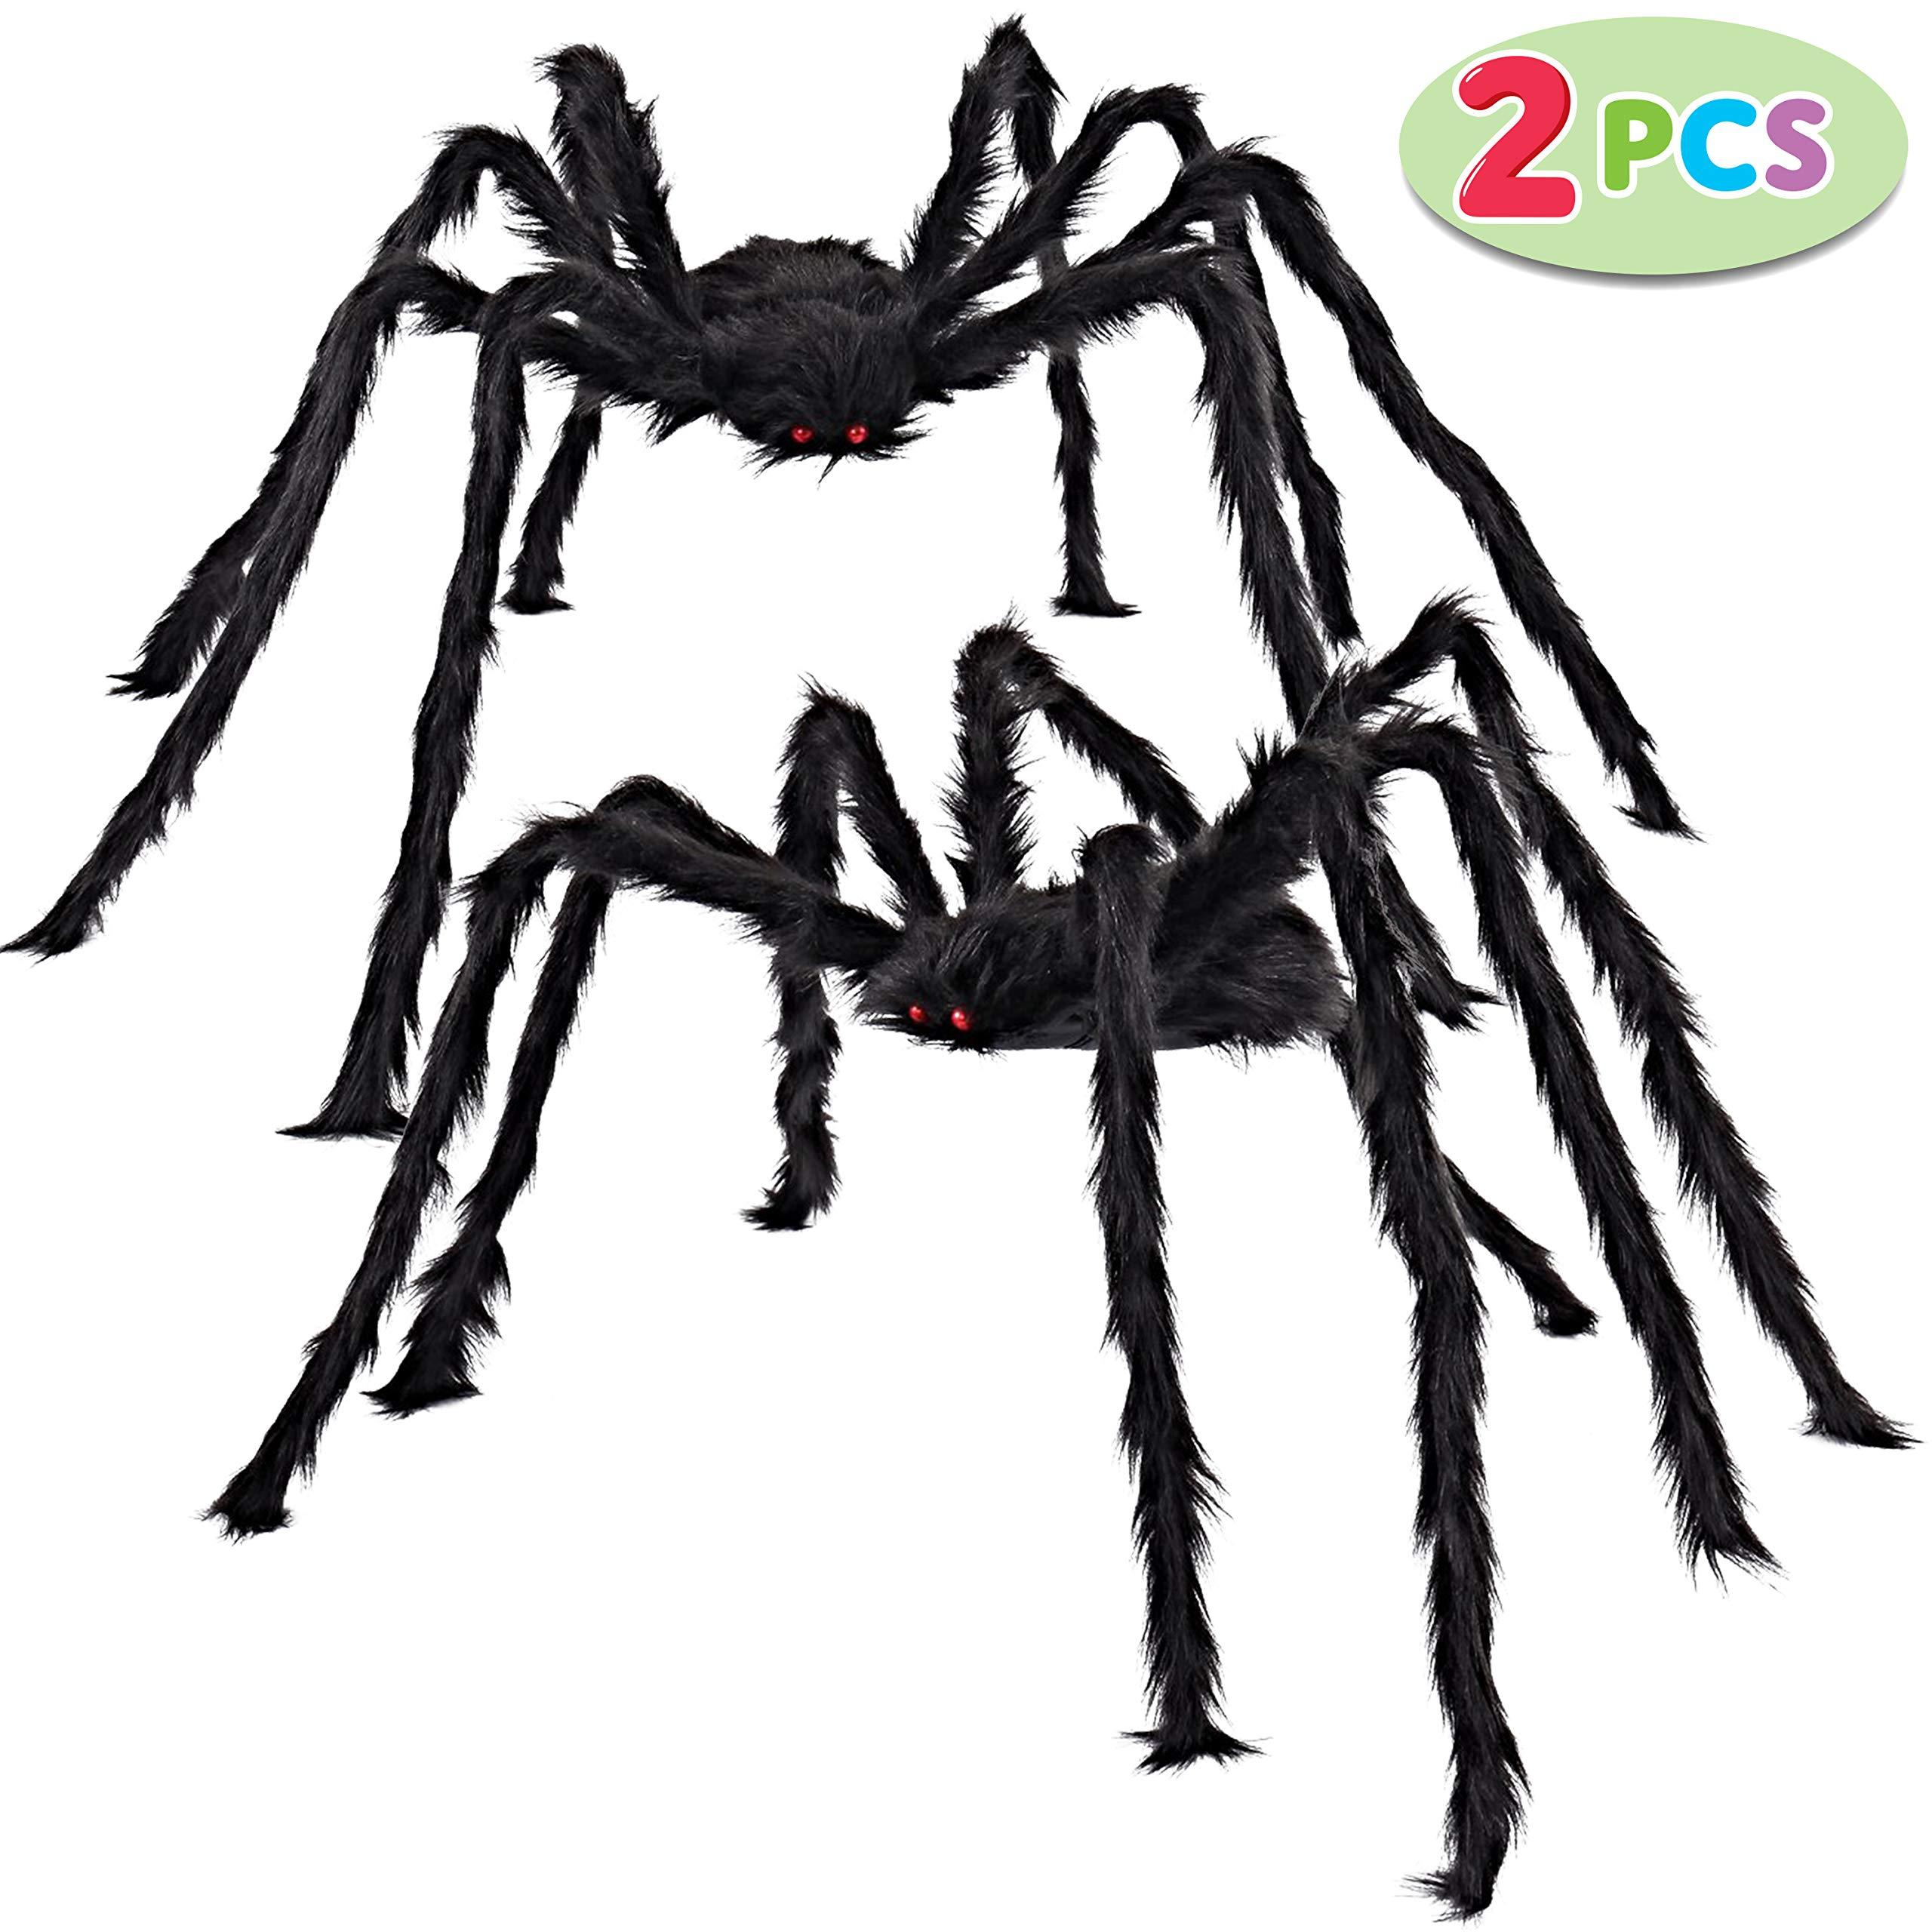 JOYIN 2 Pack 5 Ft. Halloween Outdoor Decorations Hairy Spider (Black) by JOYIN